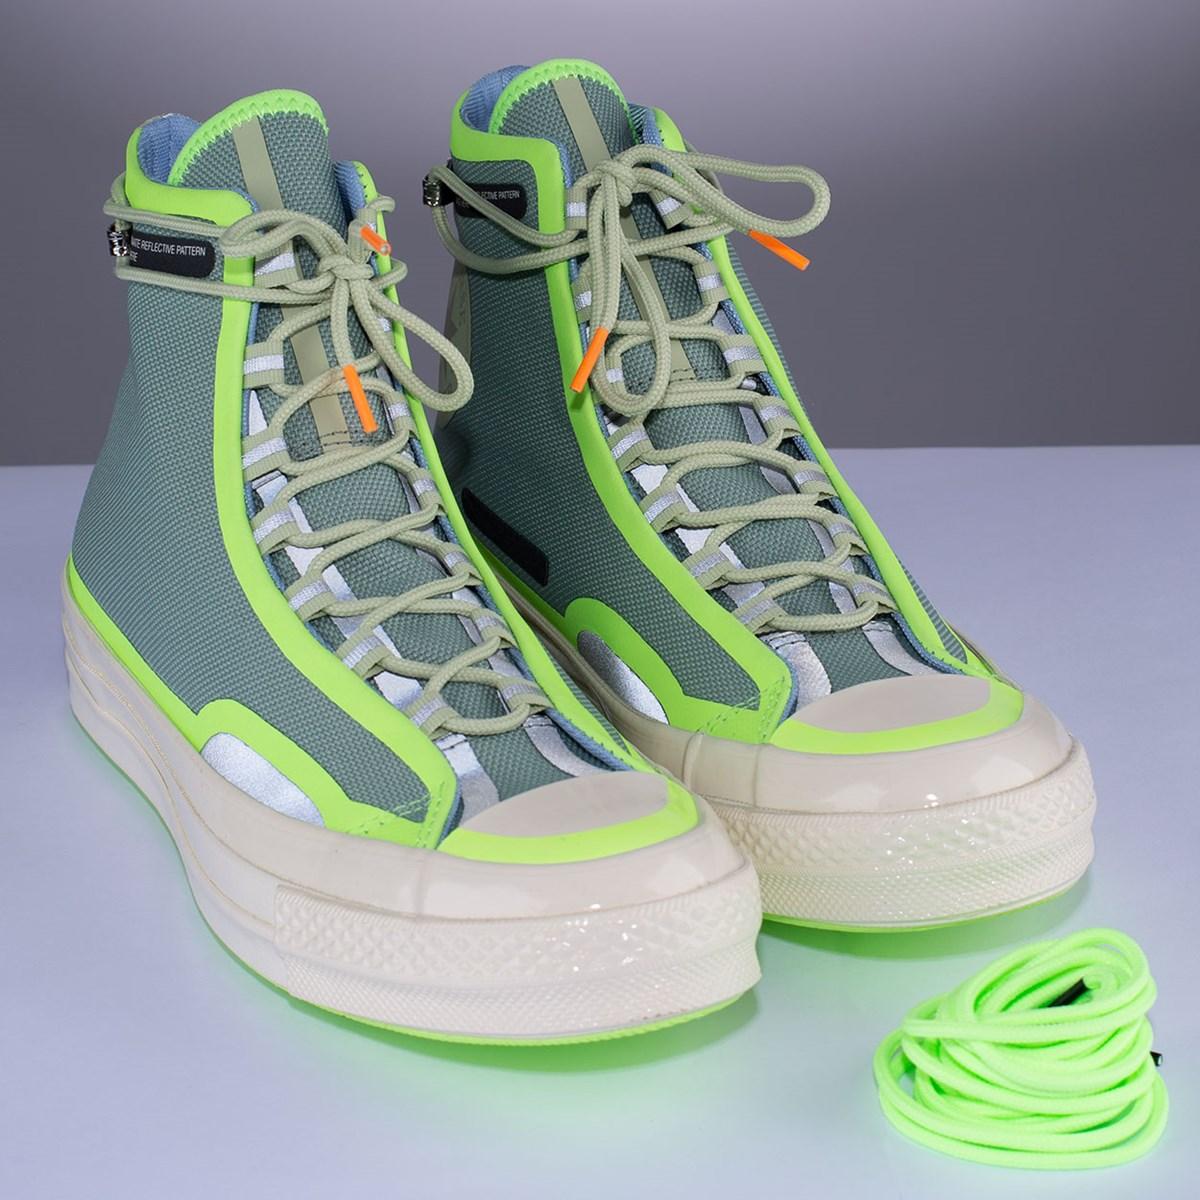 Tênis Converse Chuck 70 Hi Seam Tape Iceberg Green 169526C